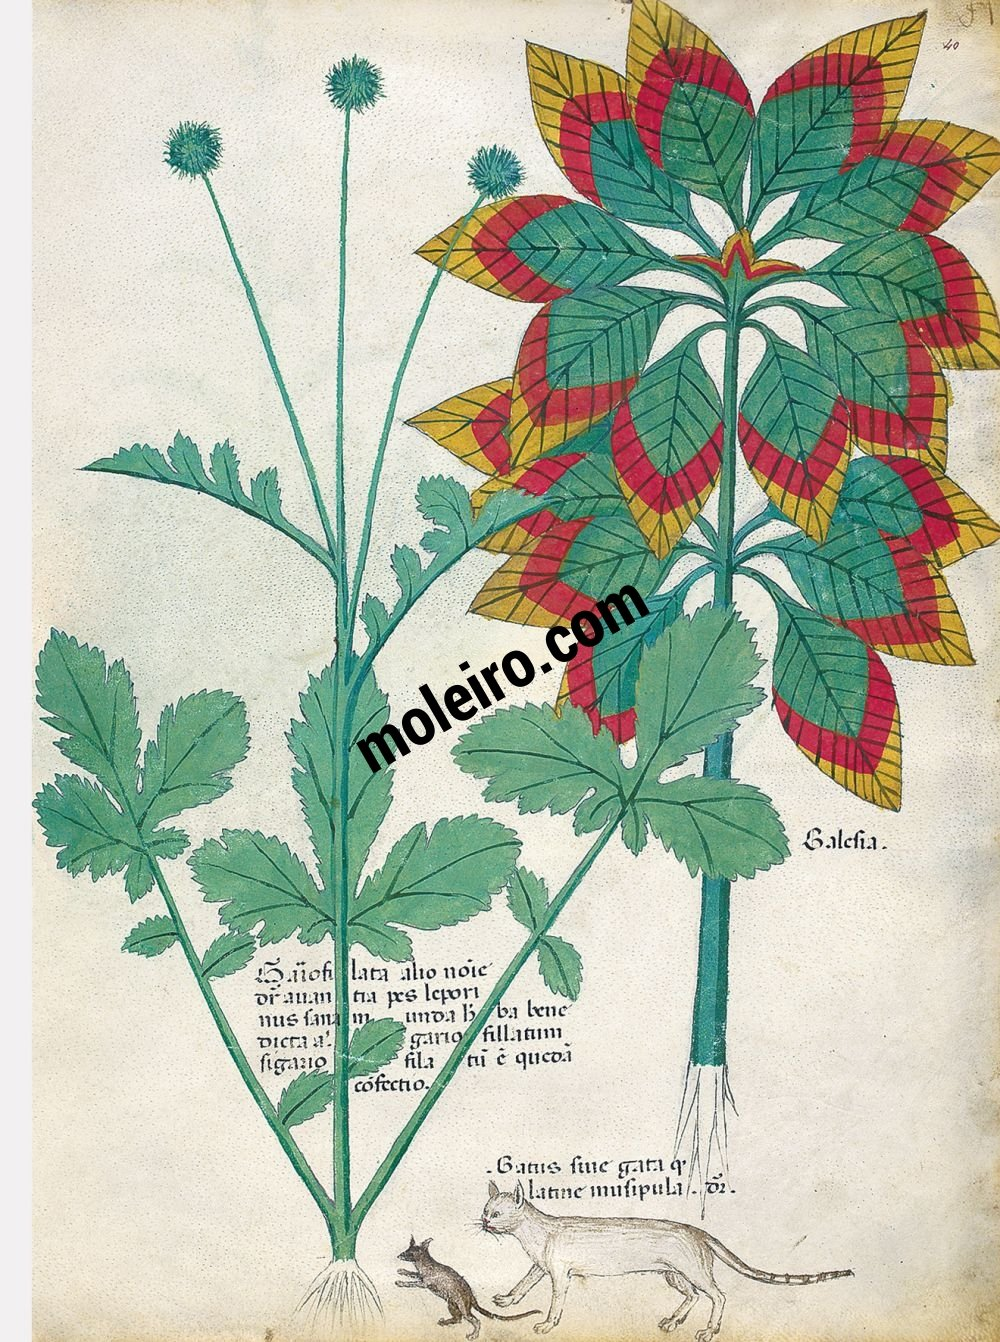 Tractatus de Herbis - Sloane 4016 f. 40r